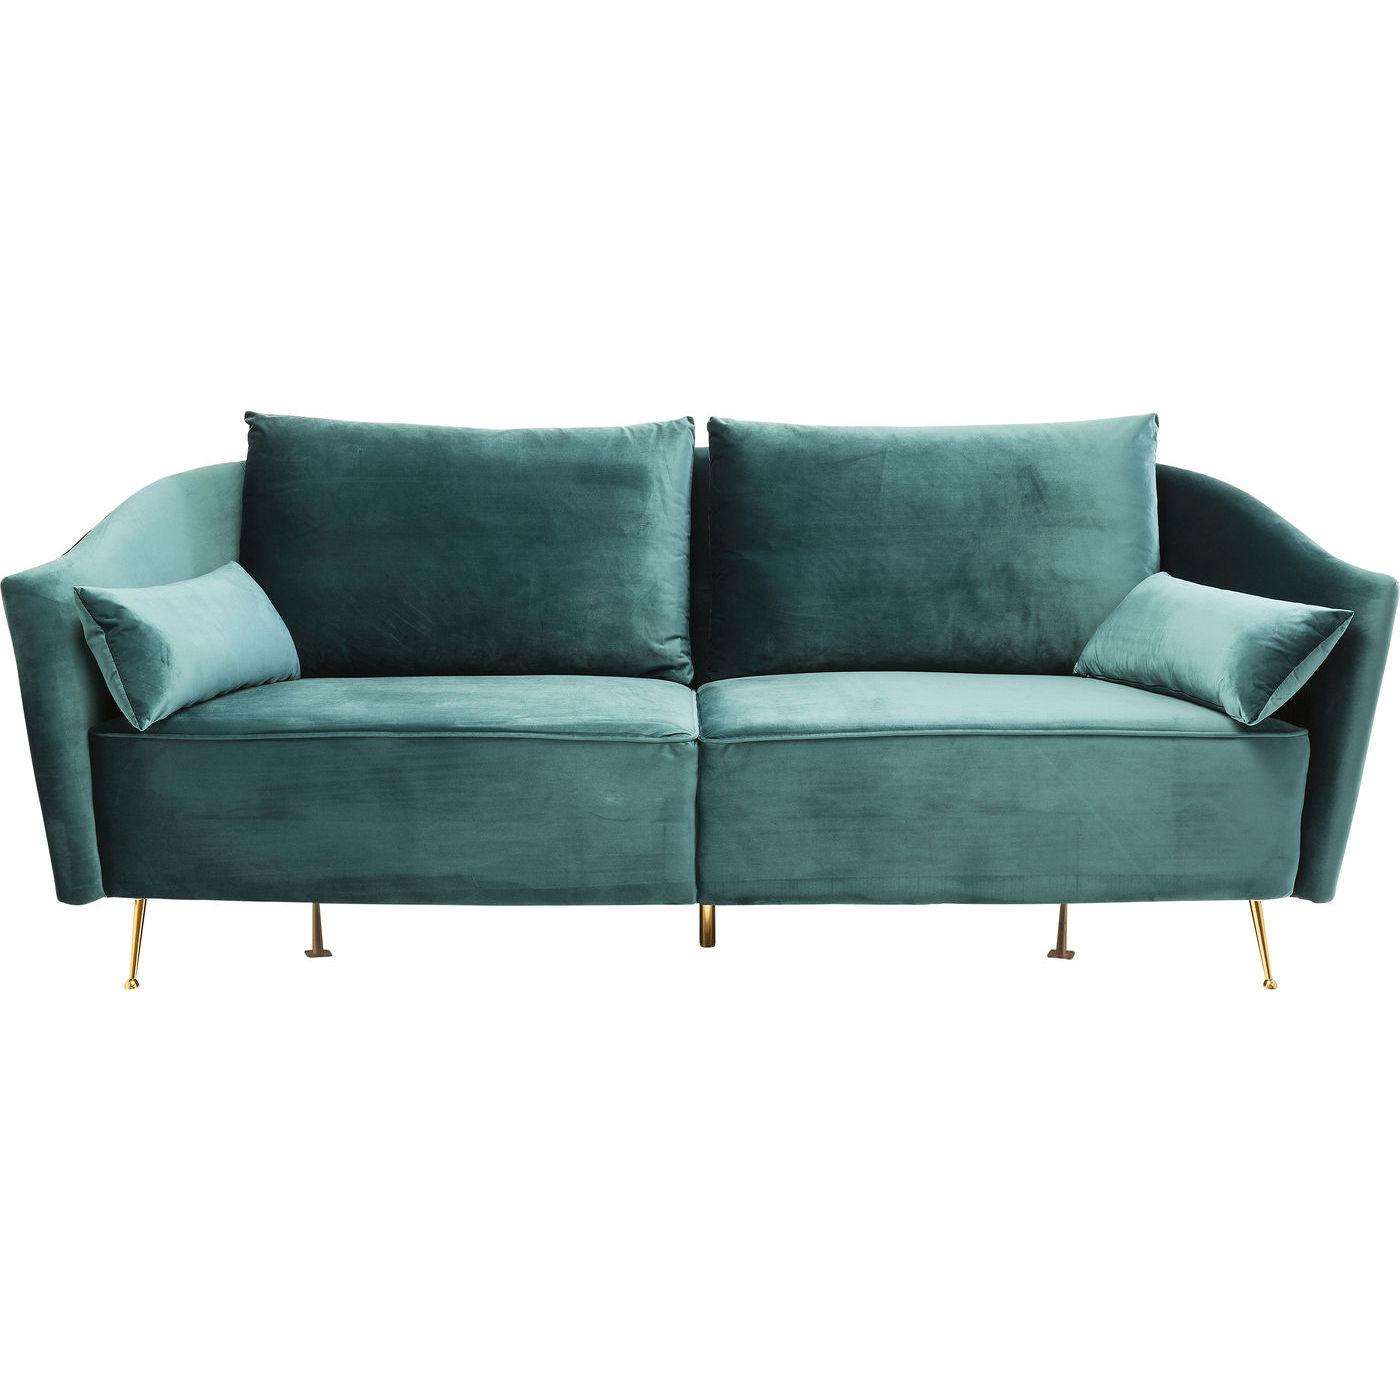 KARE DESIGN Vegas Forever Bluegreen 3-personers sofa - bl/grnt stof og guld stl, m. armln